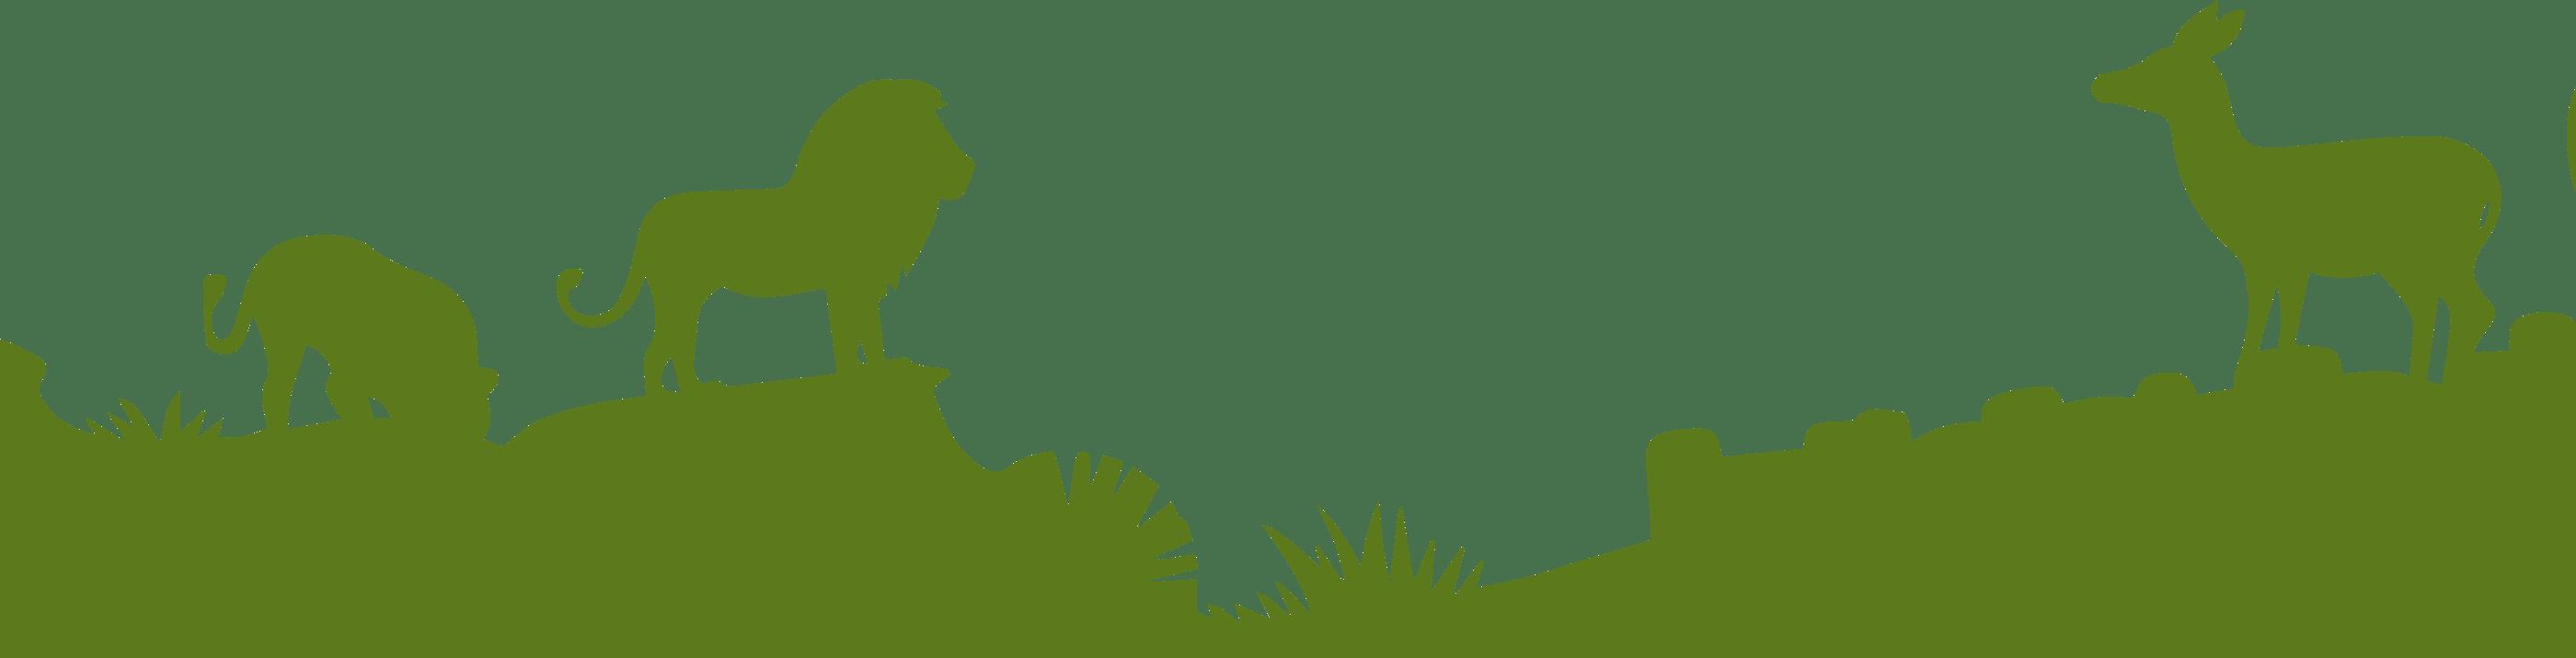 Hills clipart patch grass. Memberships potawatomi zoo a